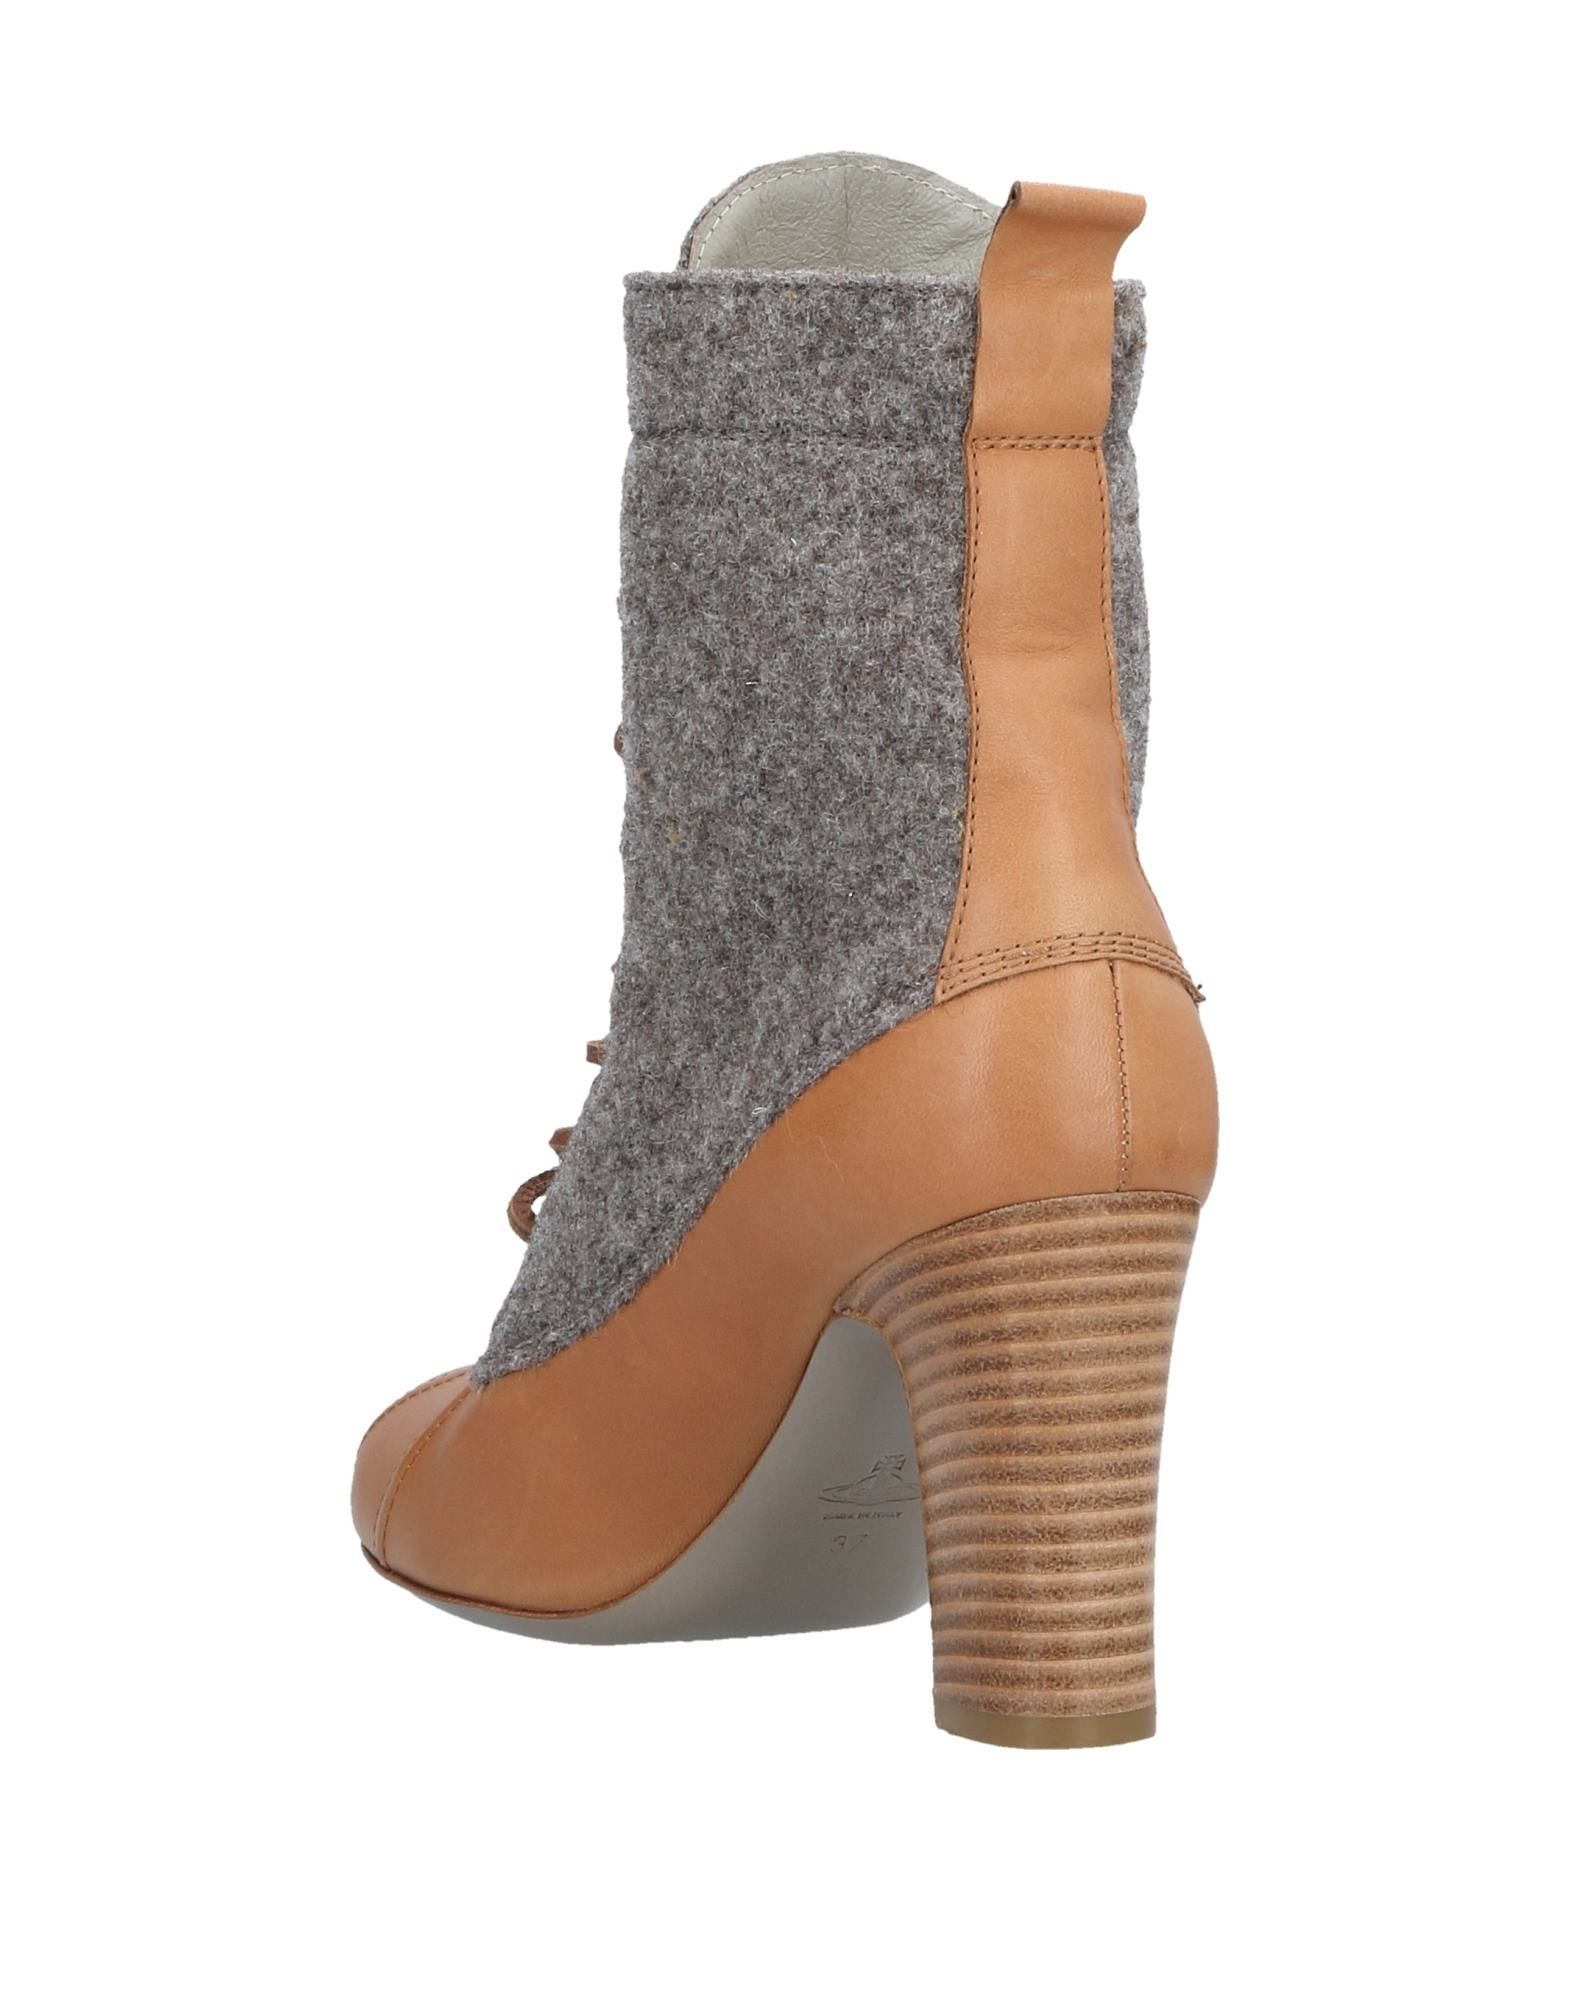 Vivienne Westwood Anglomania Stiefelette Damen Schuhe  11521036EJGut aussehende strapazierfähige Schuhe Damen c152e9